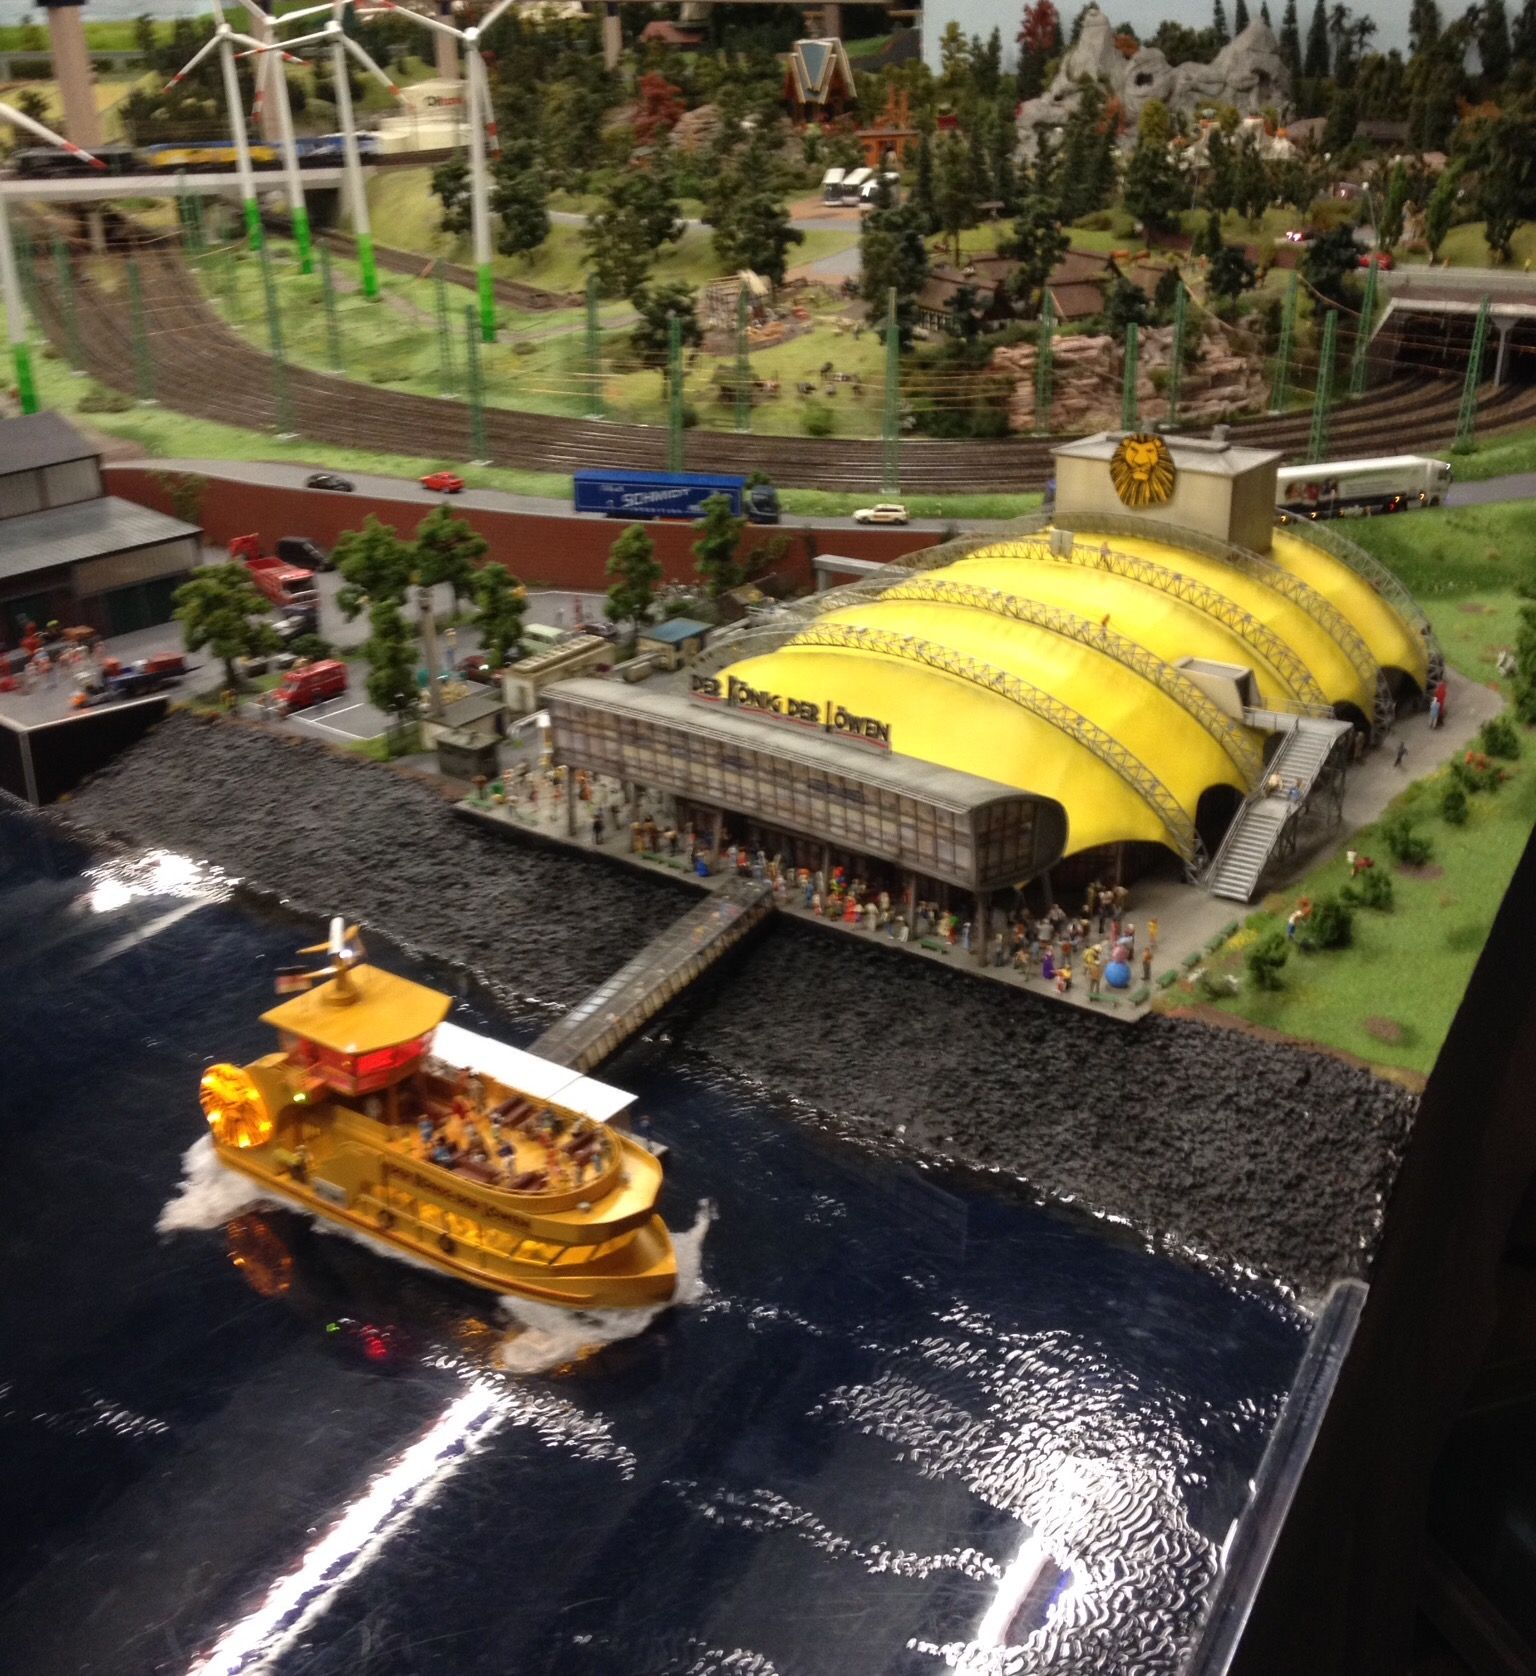 Miniatur Wunderland Hamburg (With images) Model railroad